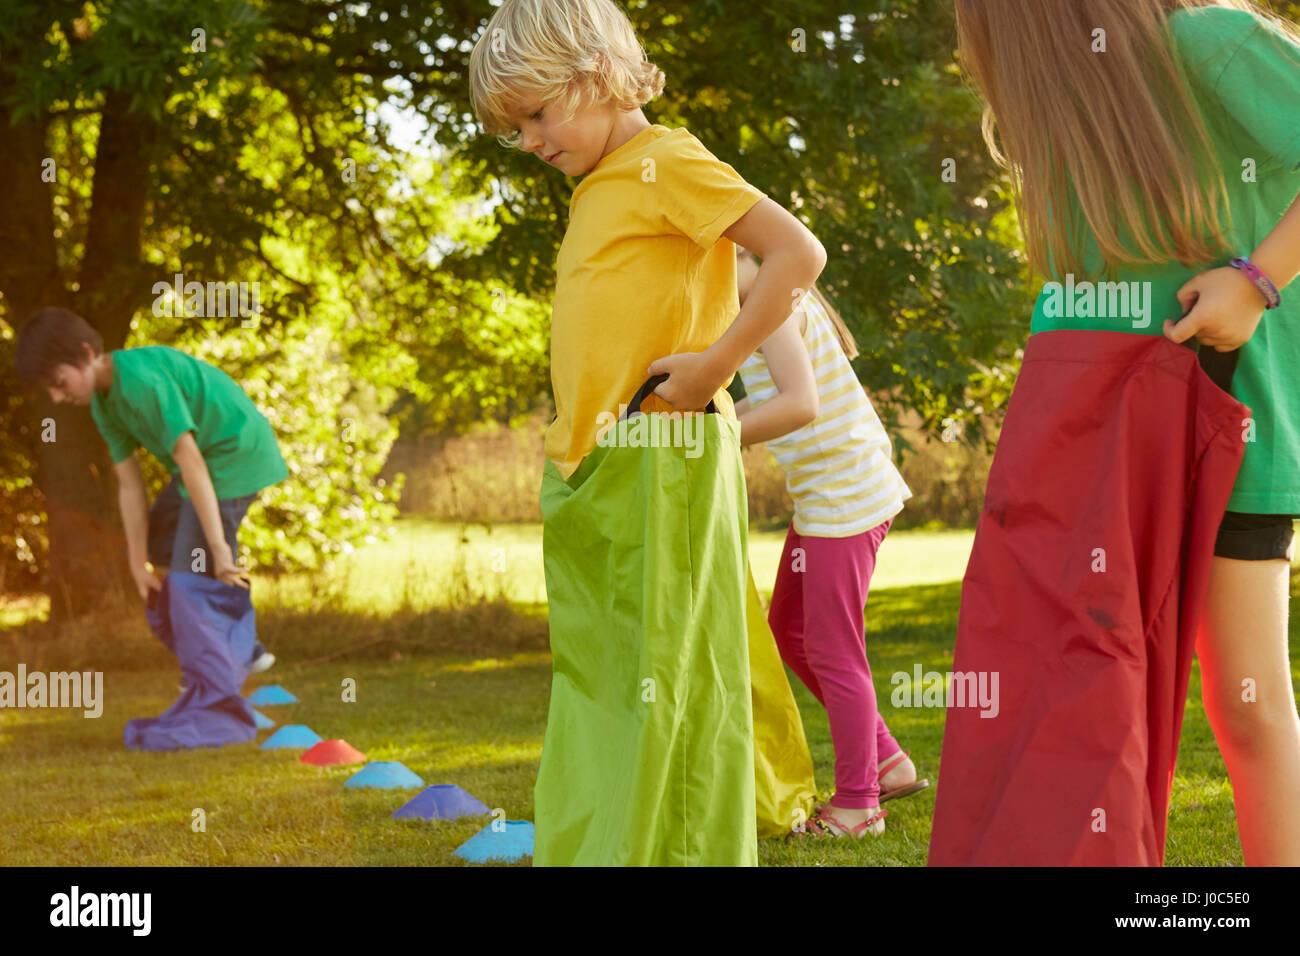 Girls and boys preparing for sack race on start line in park - Stock Image